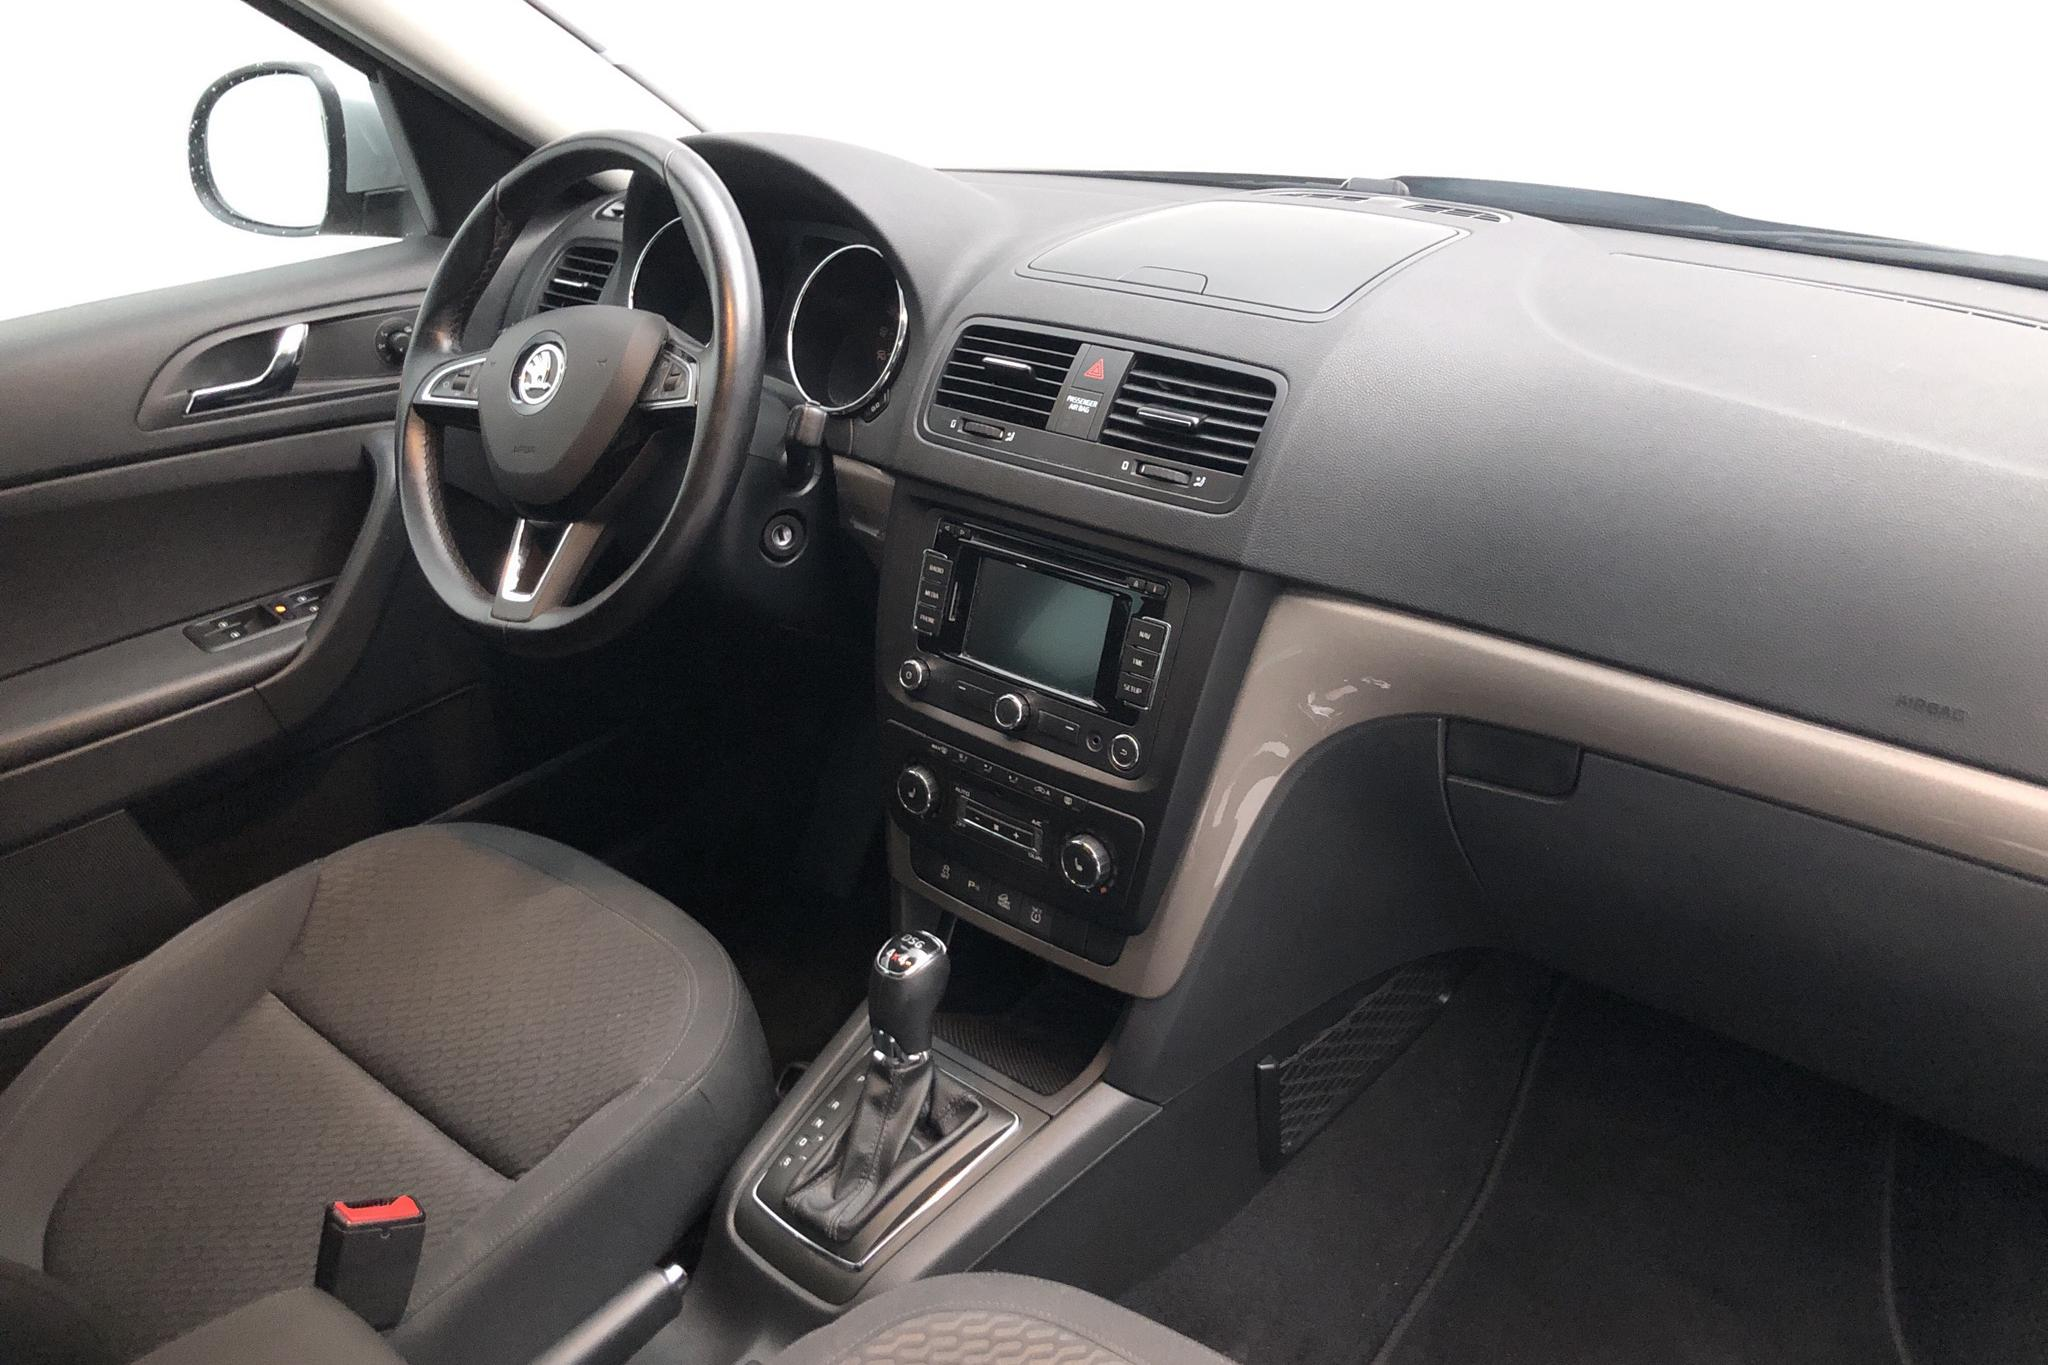 Skoda Yeti 2.0 TDI 4X4 (140hk) - 86 190 km - Automatic - brown - 2014